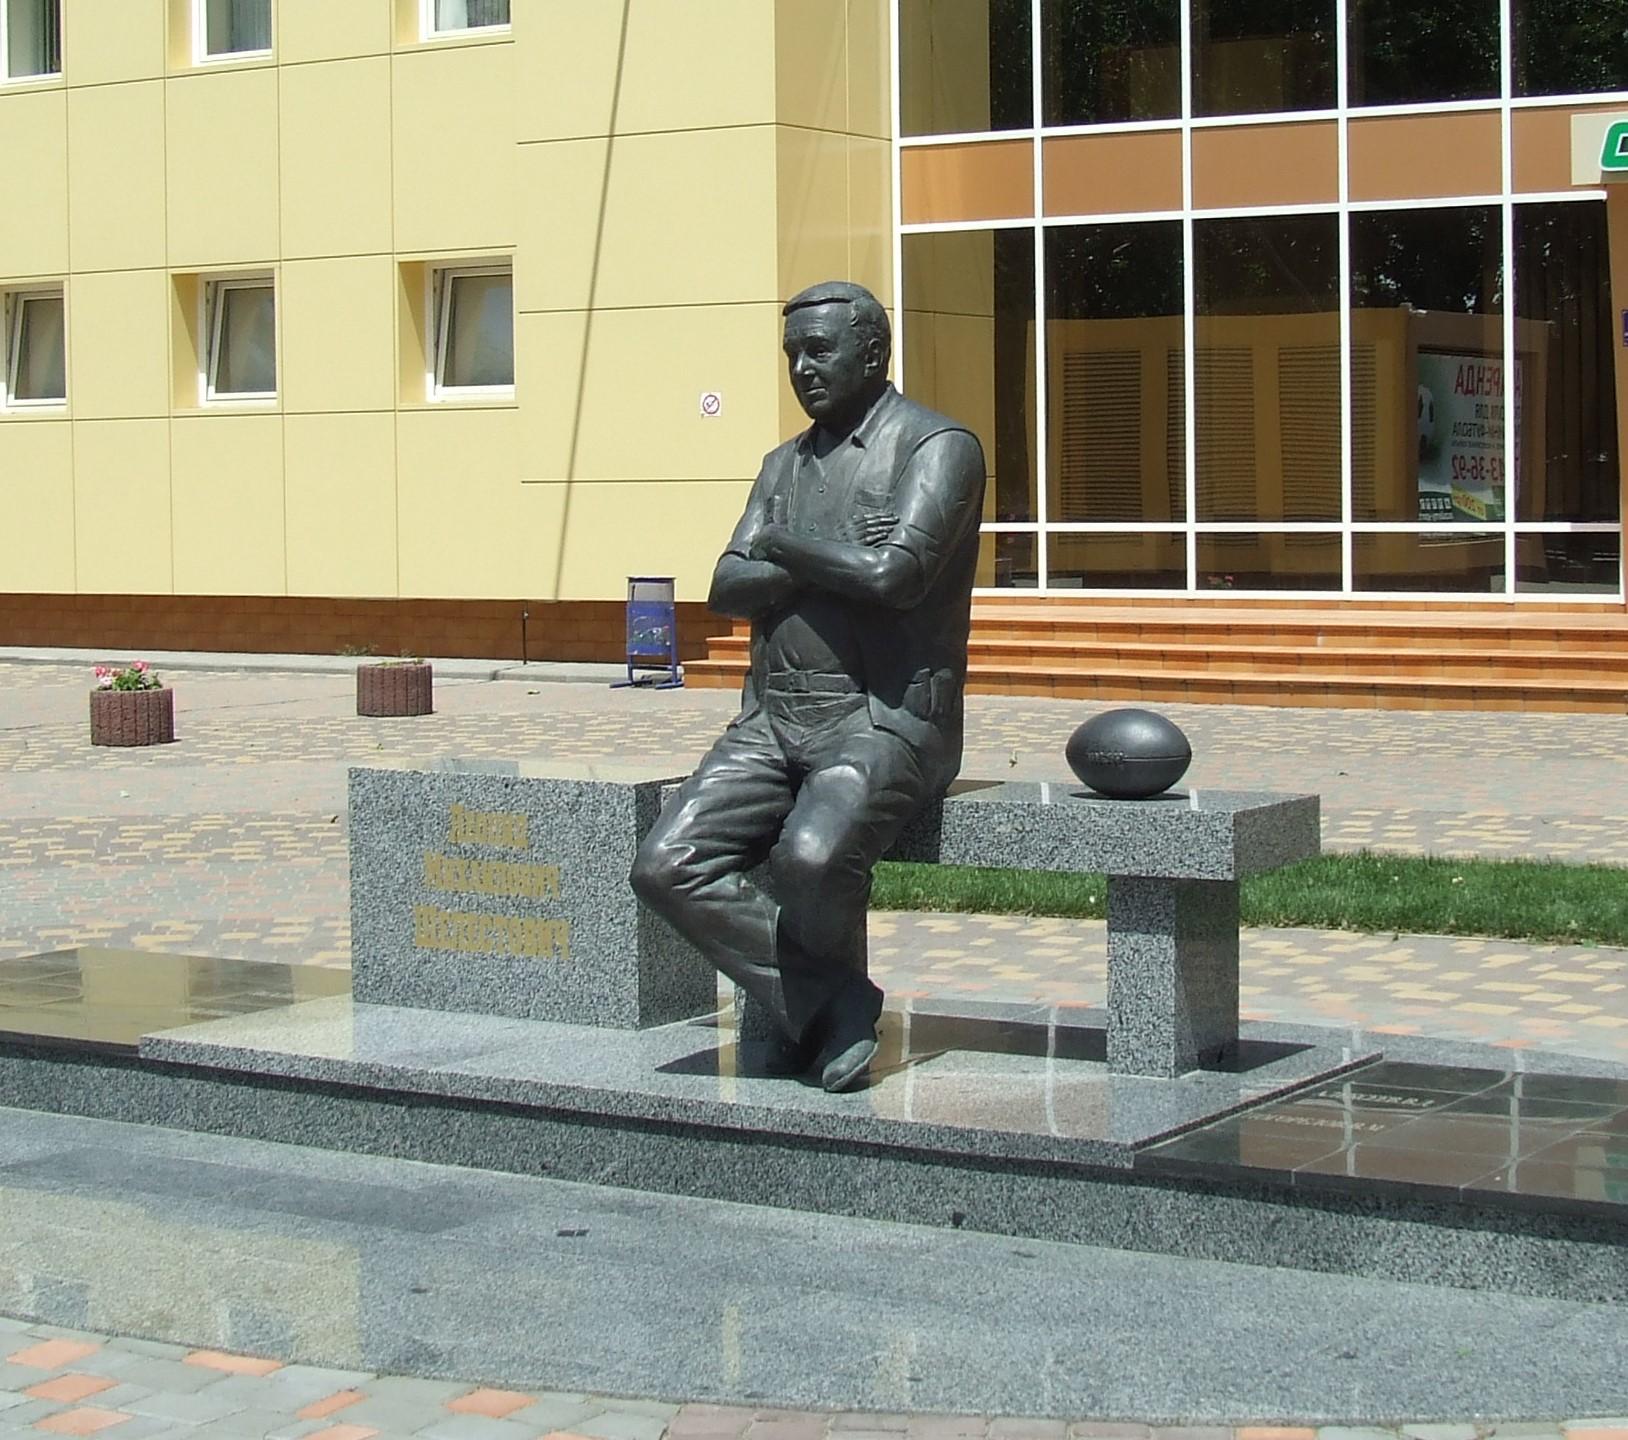 Николай Худолий, бронза, 2013г., Одесса.